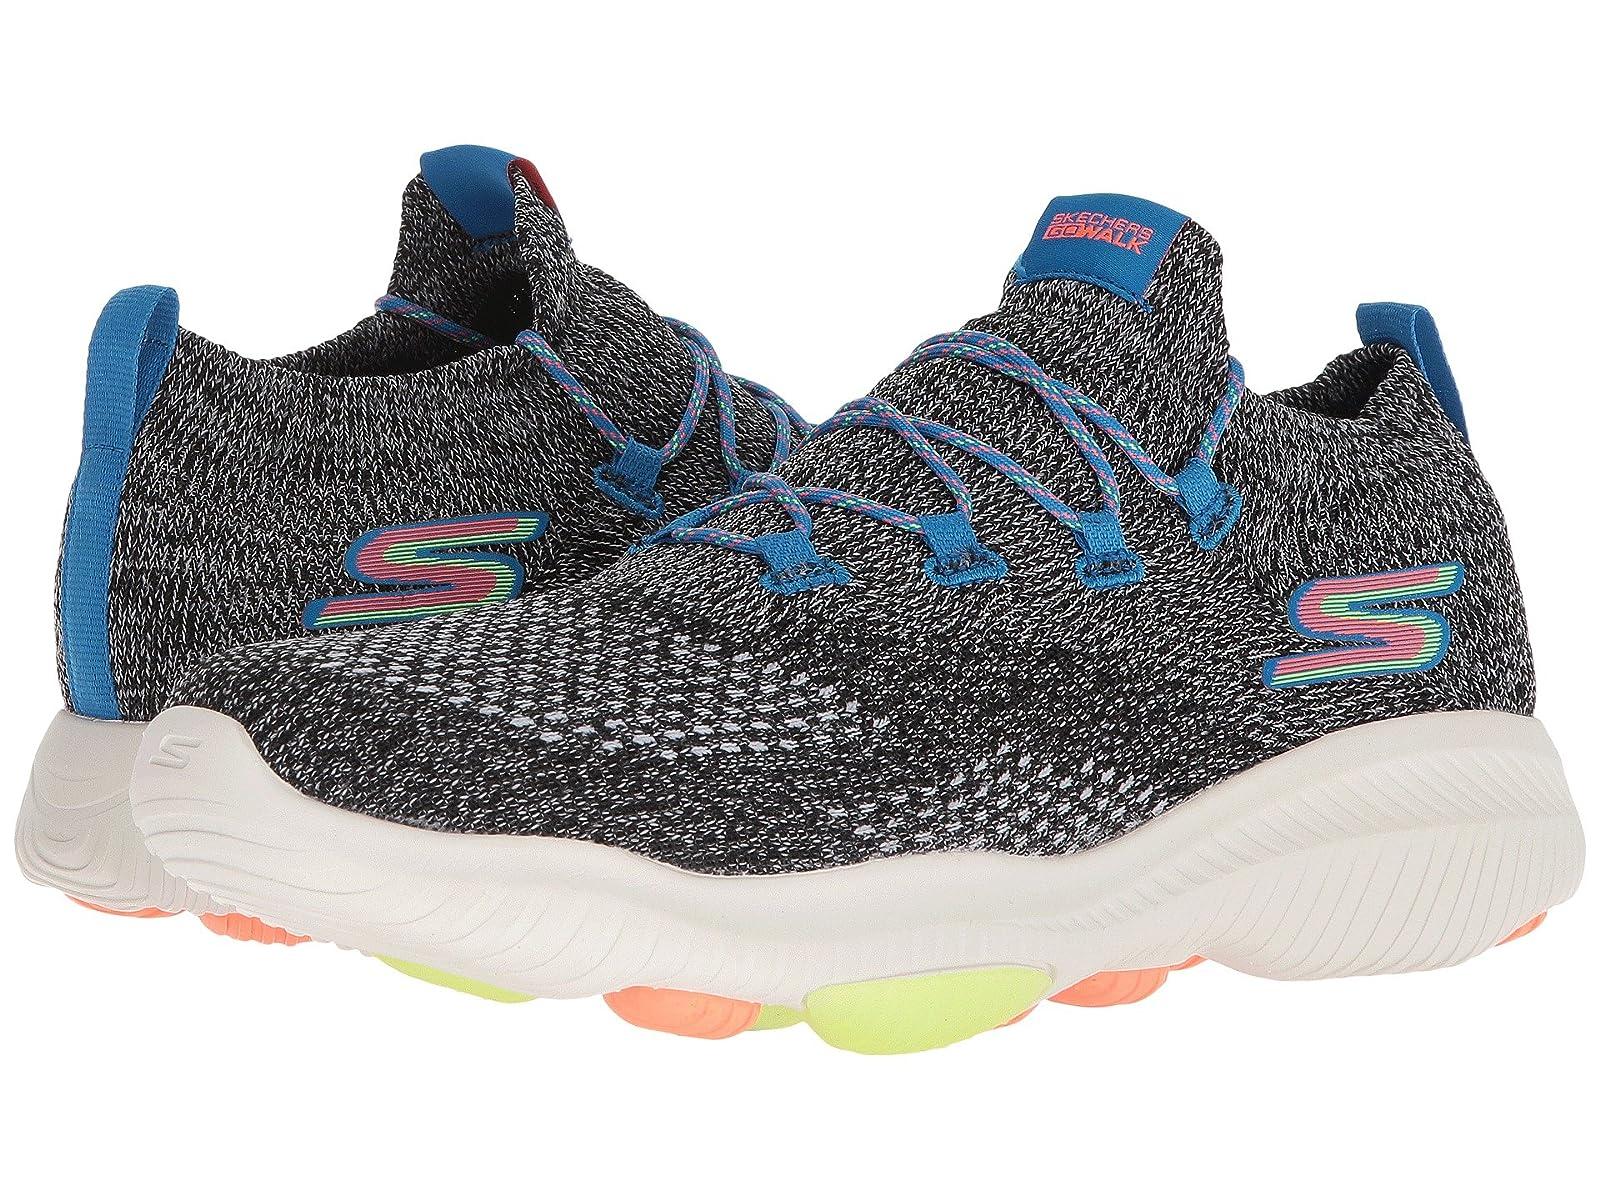 SKECHERS Performance Go Walk Revolution UltraAtmospheric grades have affordable shoes